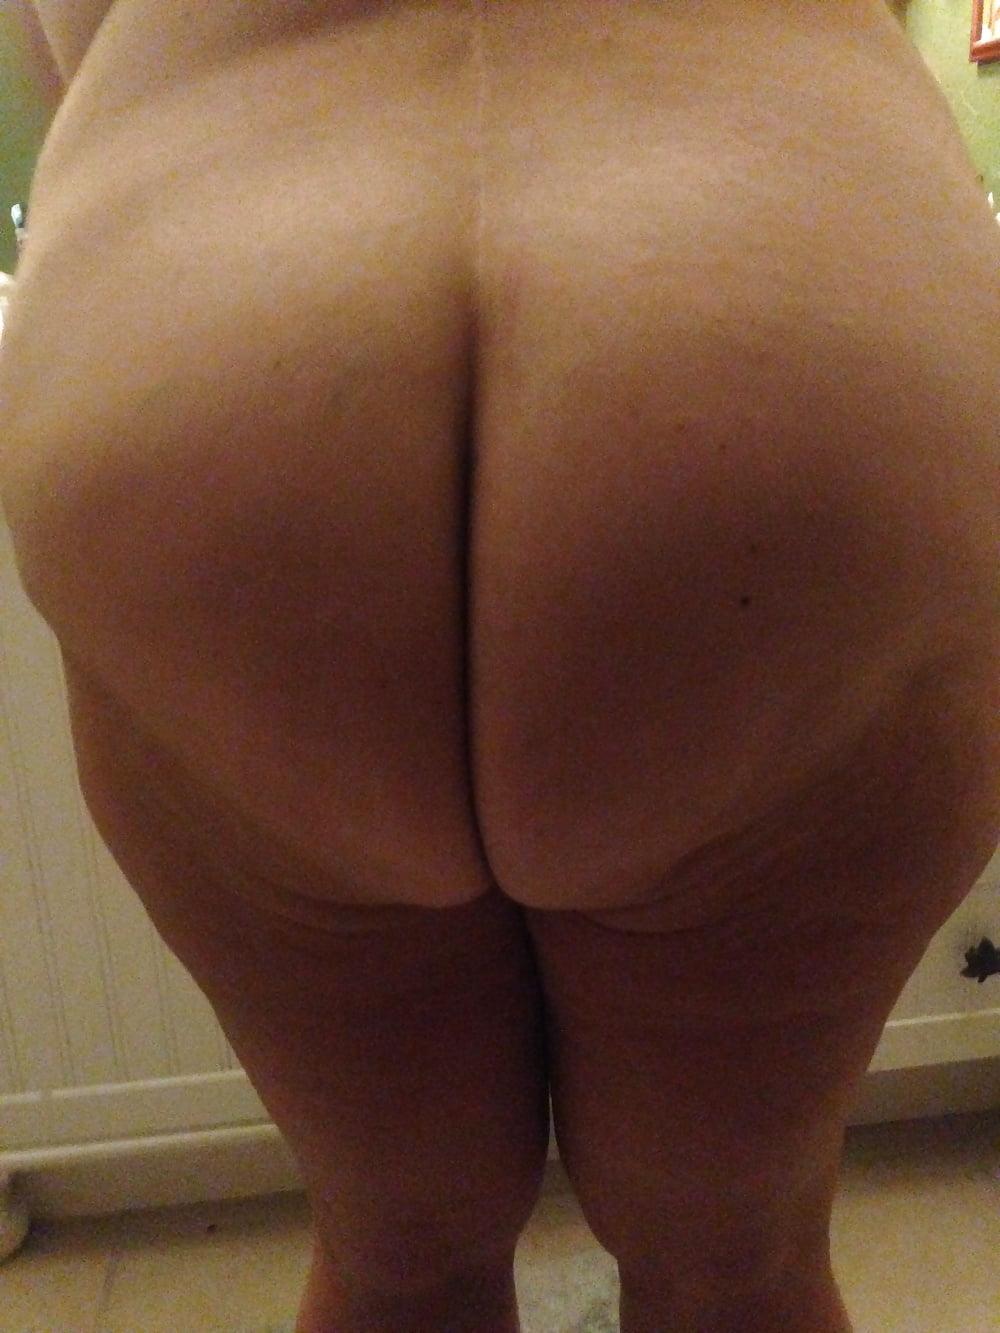 Porn archive Free full length chubby lesbian porn